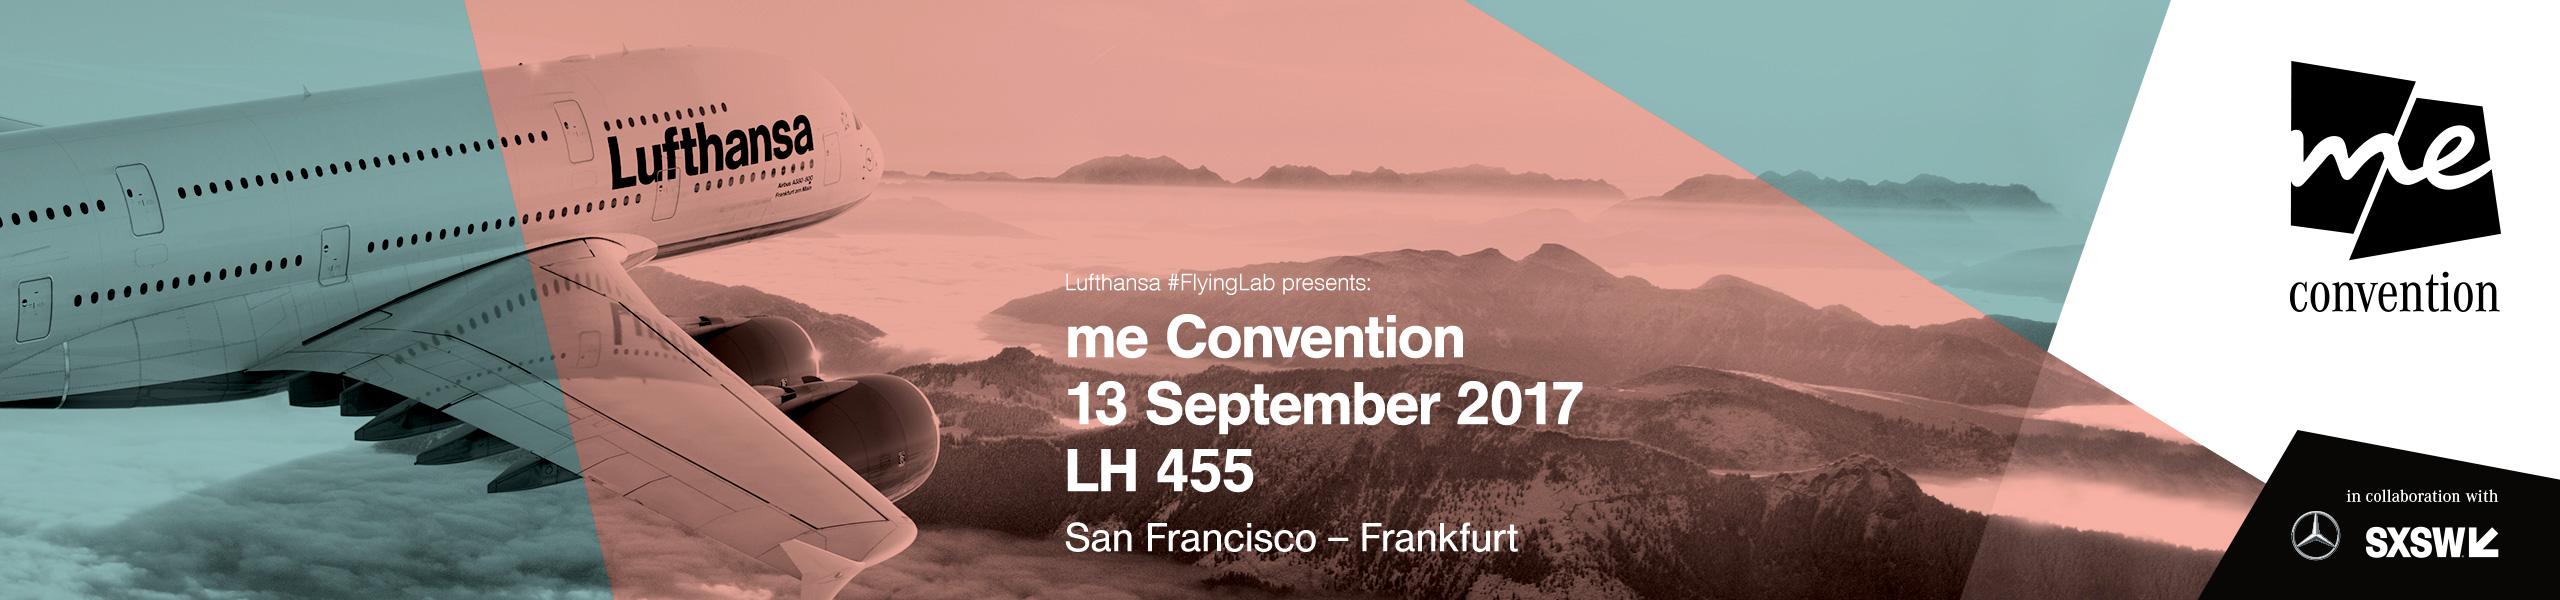 Lufthansa FlyingLab me Convention